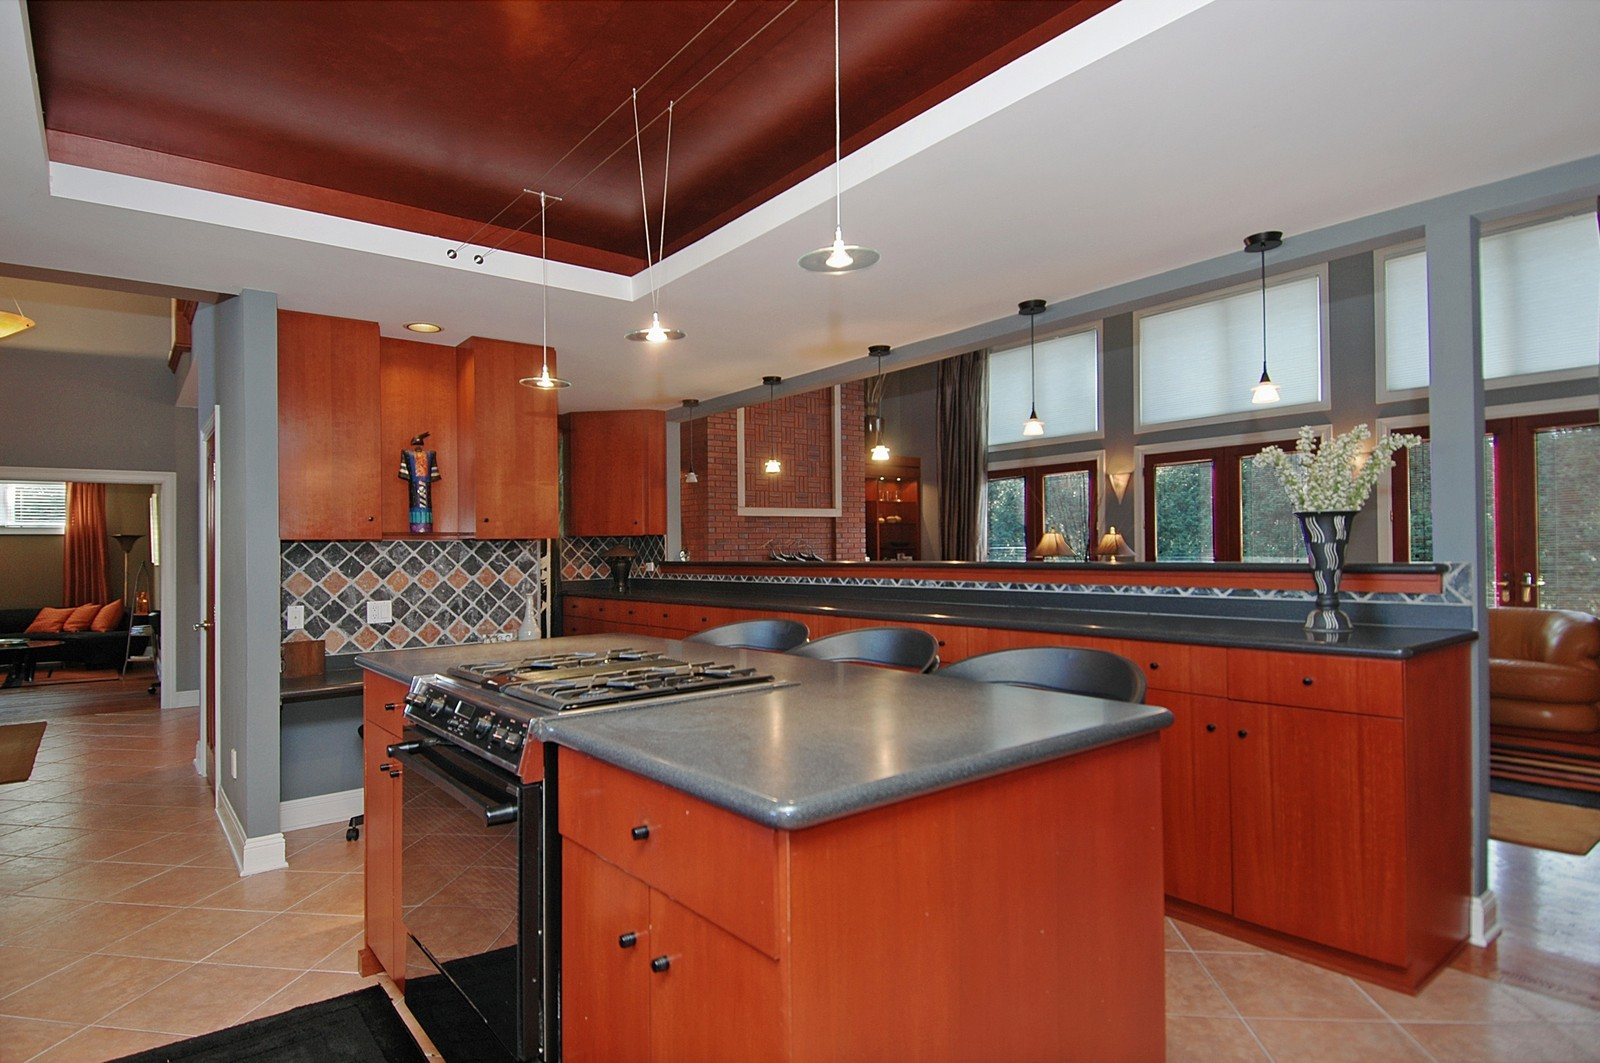 Real Estate Photography - 751 Lake, Crystal Lake, IL, 60014 - Kitchen